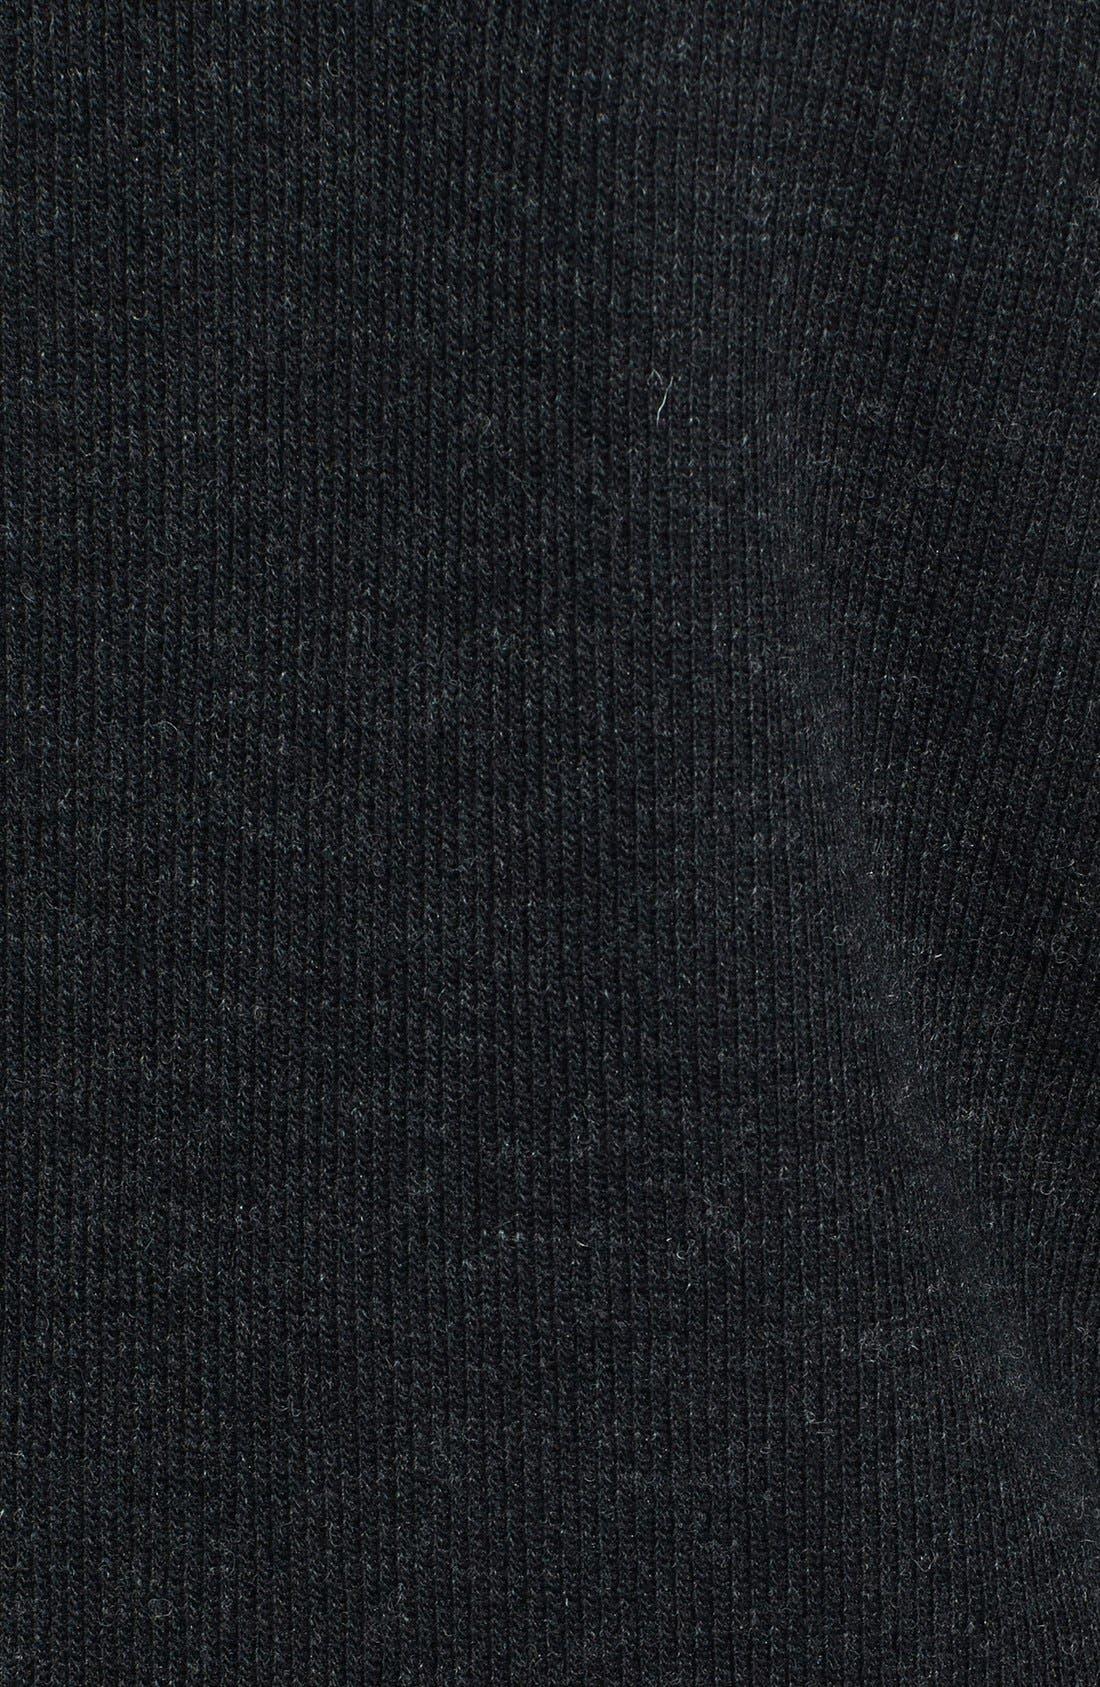 Alternate Image 3  - Merrell 'Big Sky' Fleece Knit Jacket (Online Only)